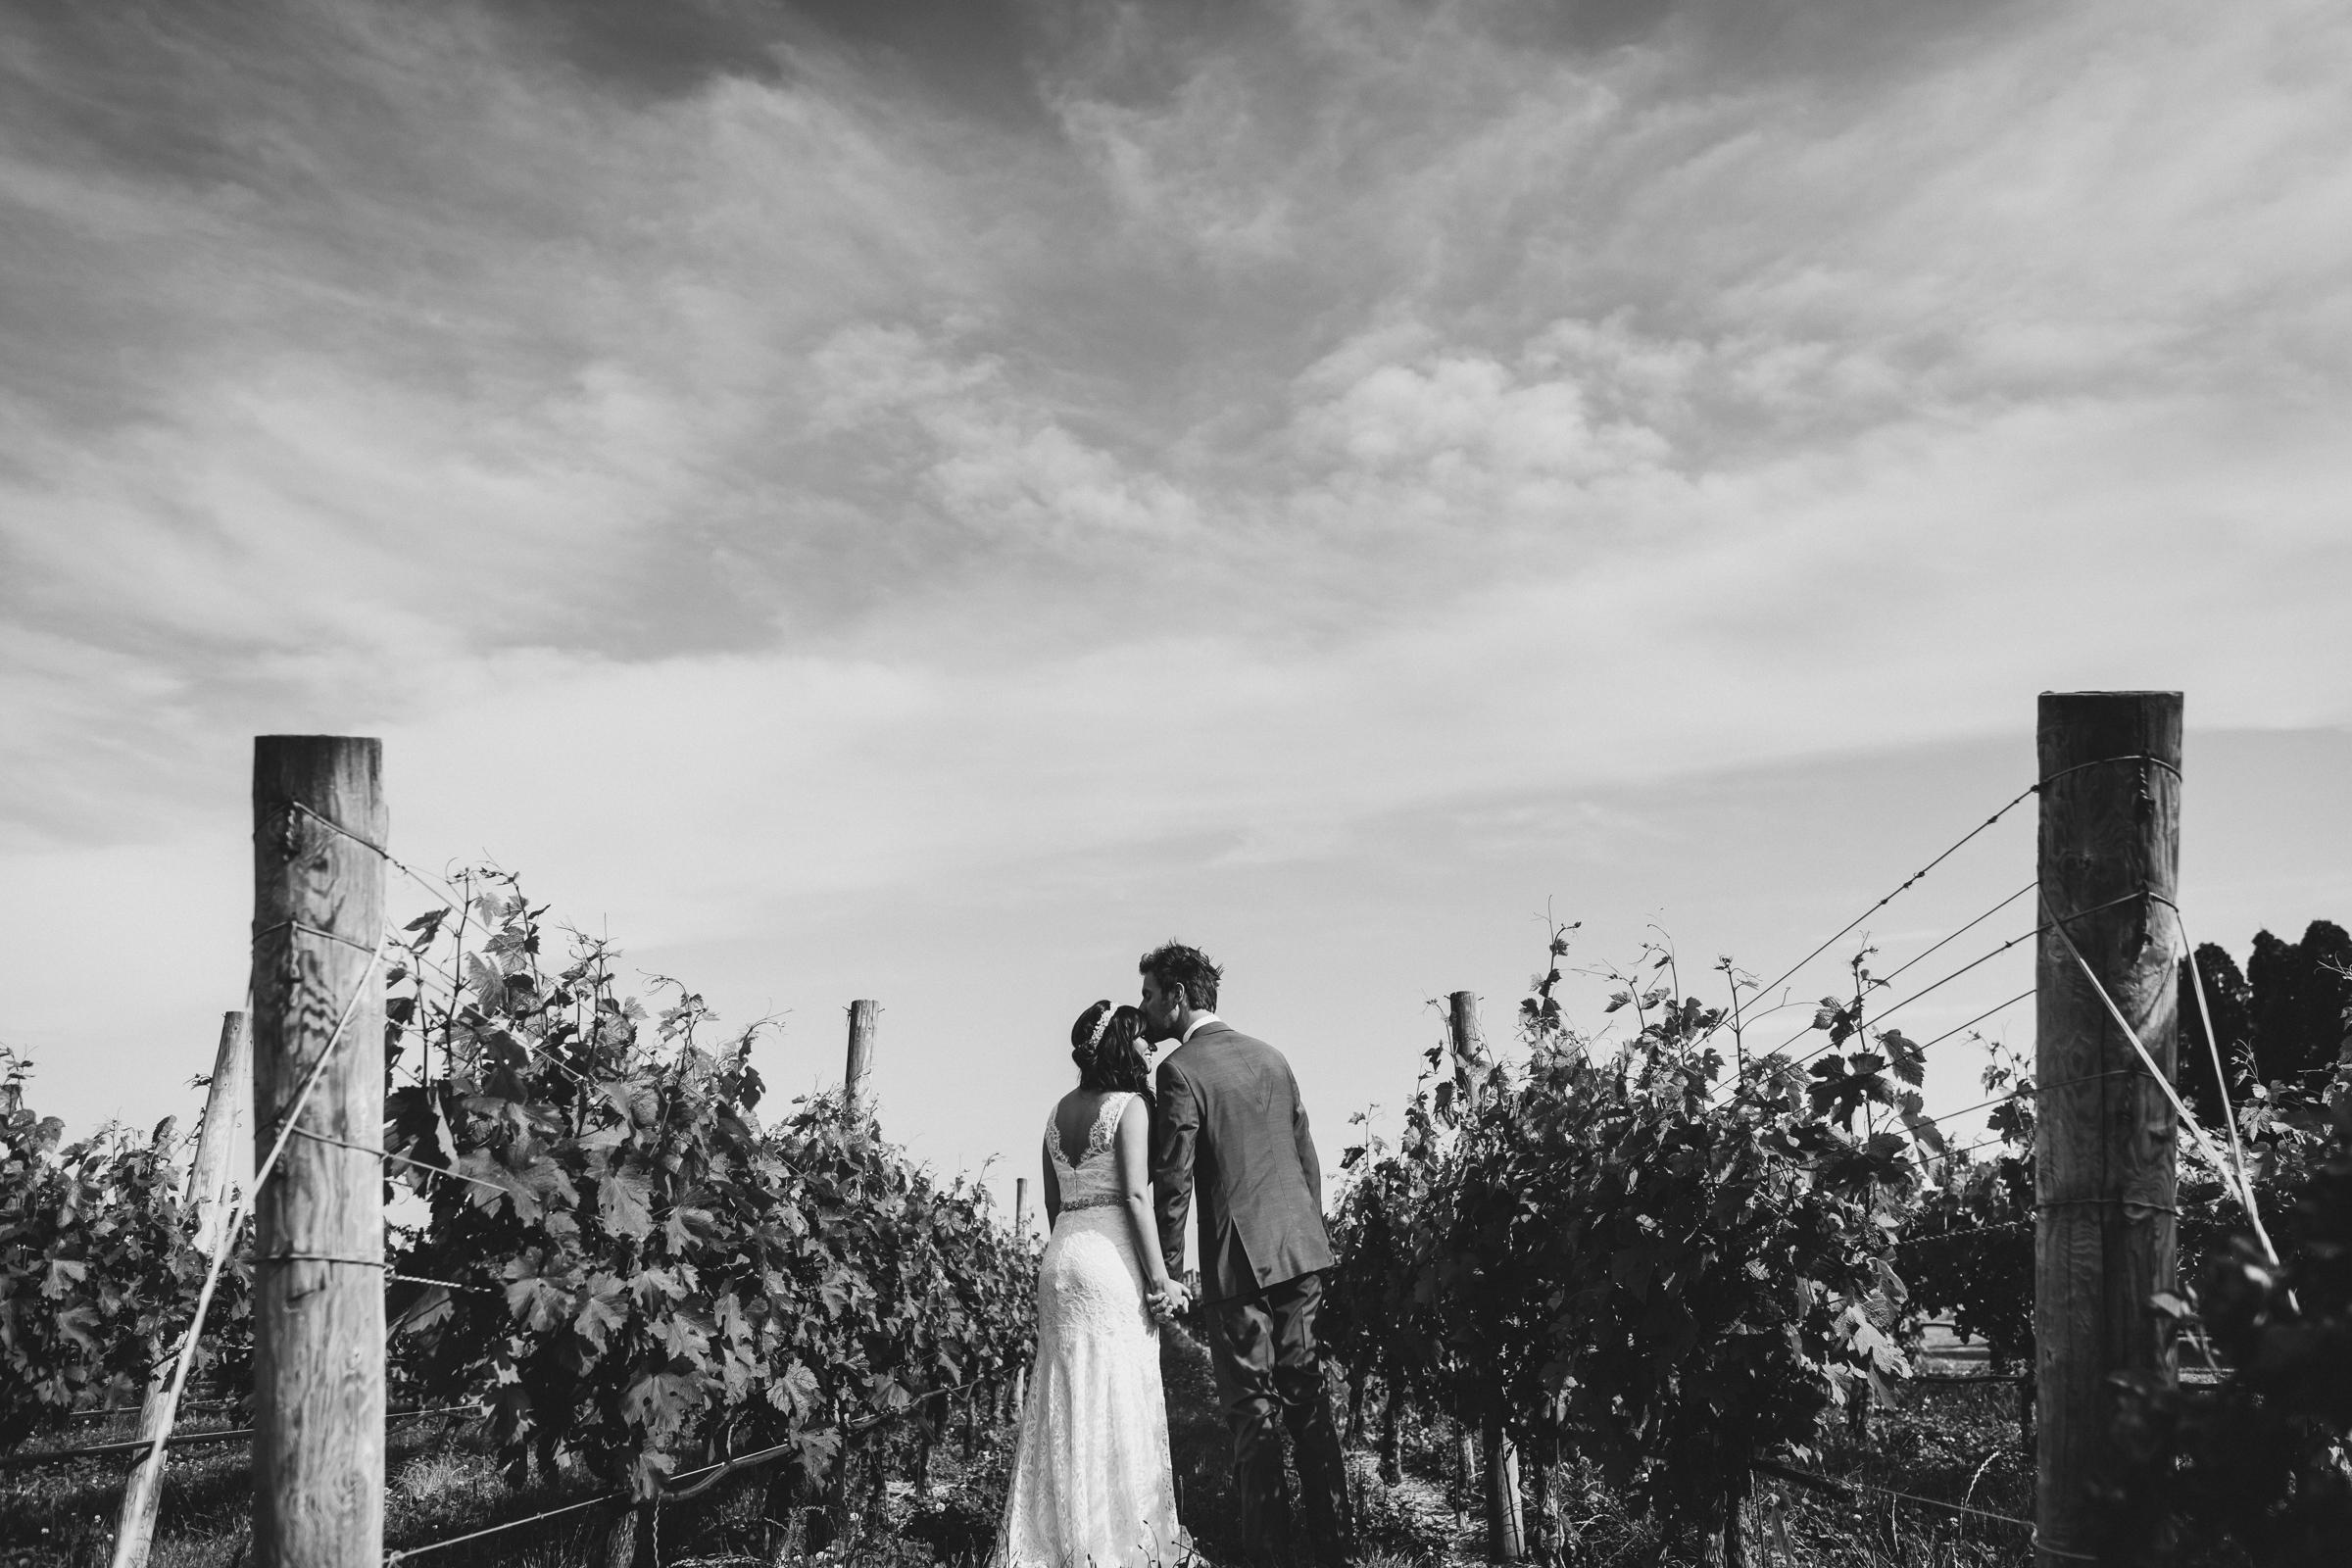 Martha-Clara-Vineyard-Long-Island-Documentary-Wedding-Photographer-34.jpg